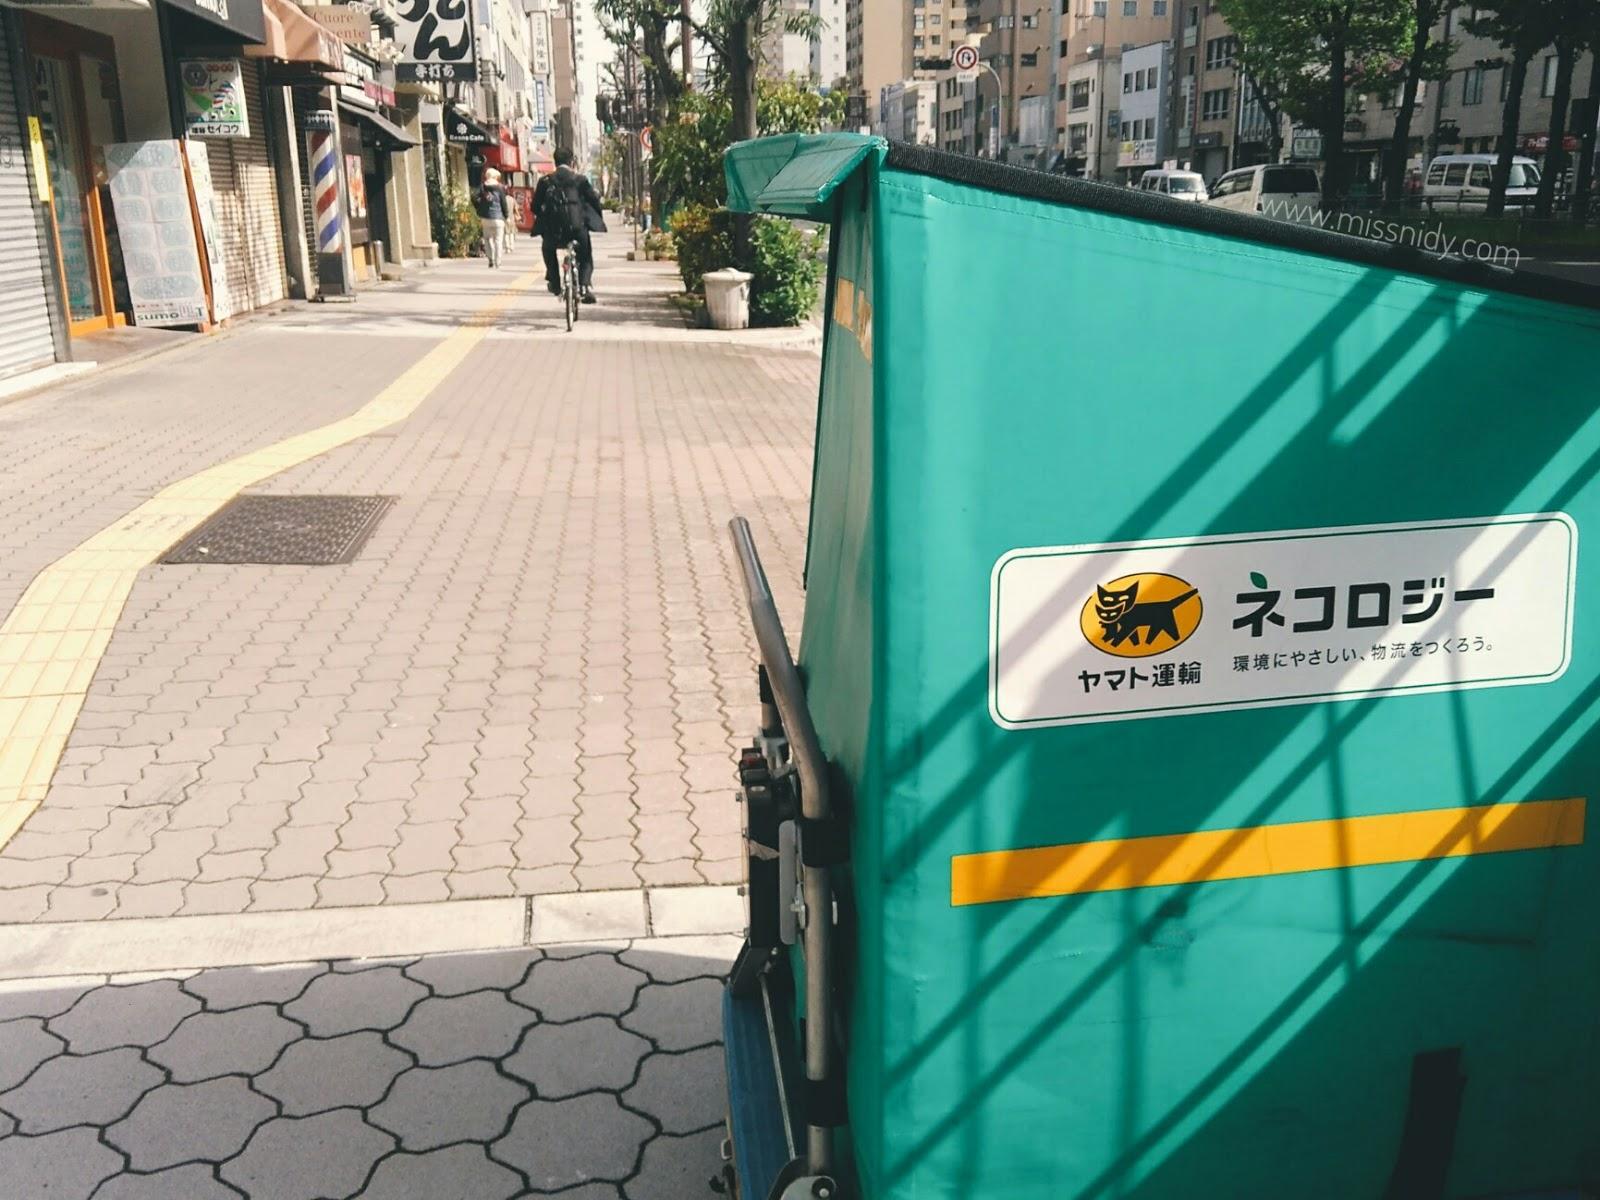 delivery koper di jepang